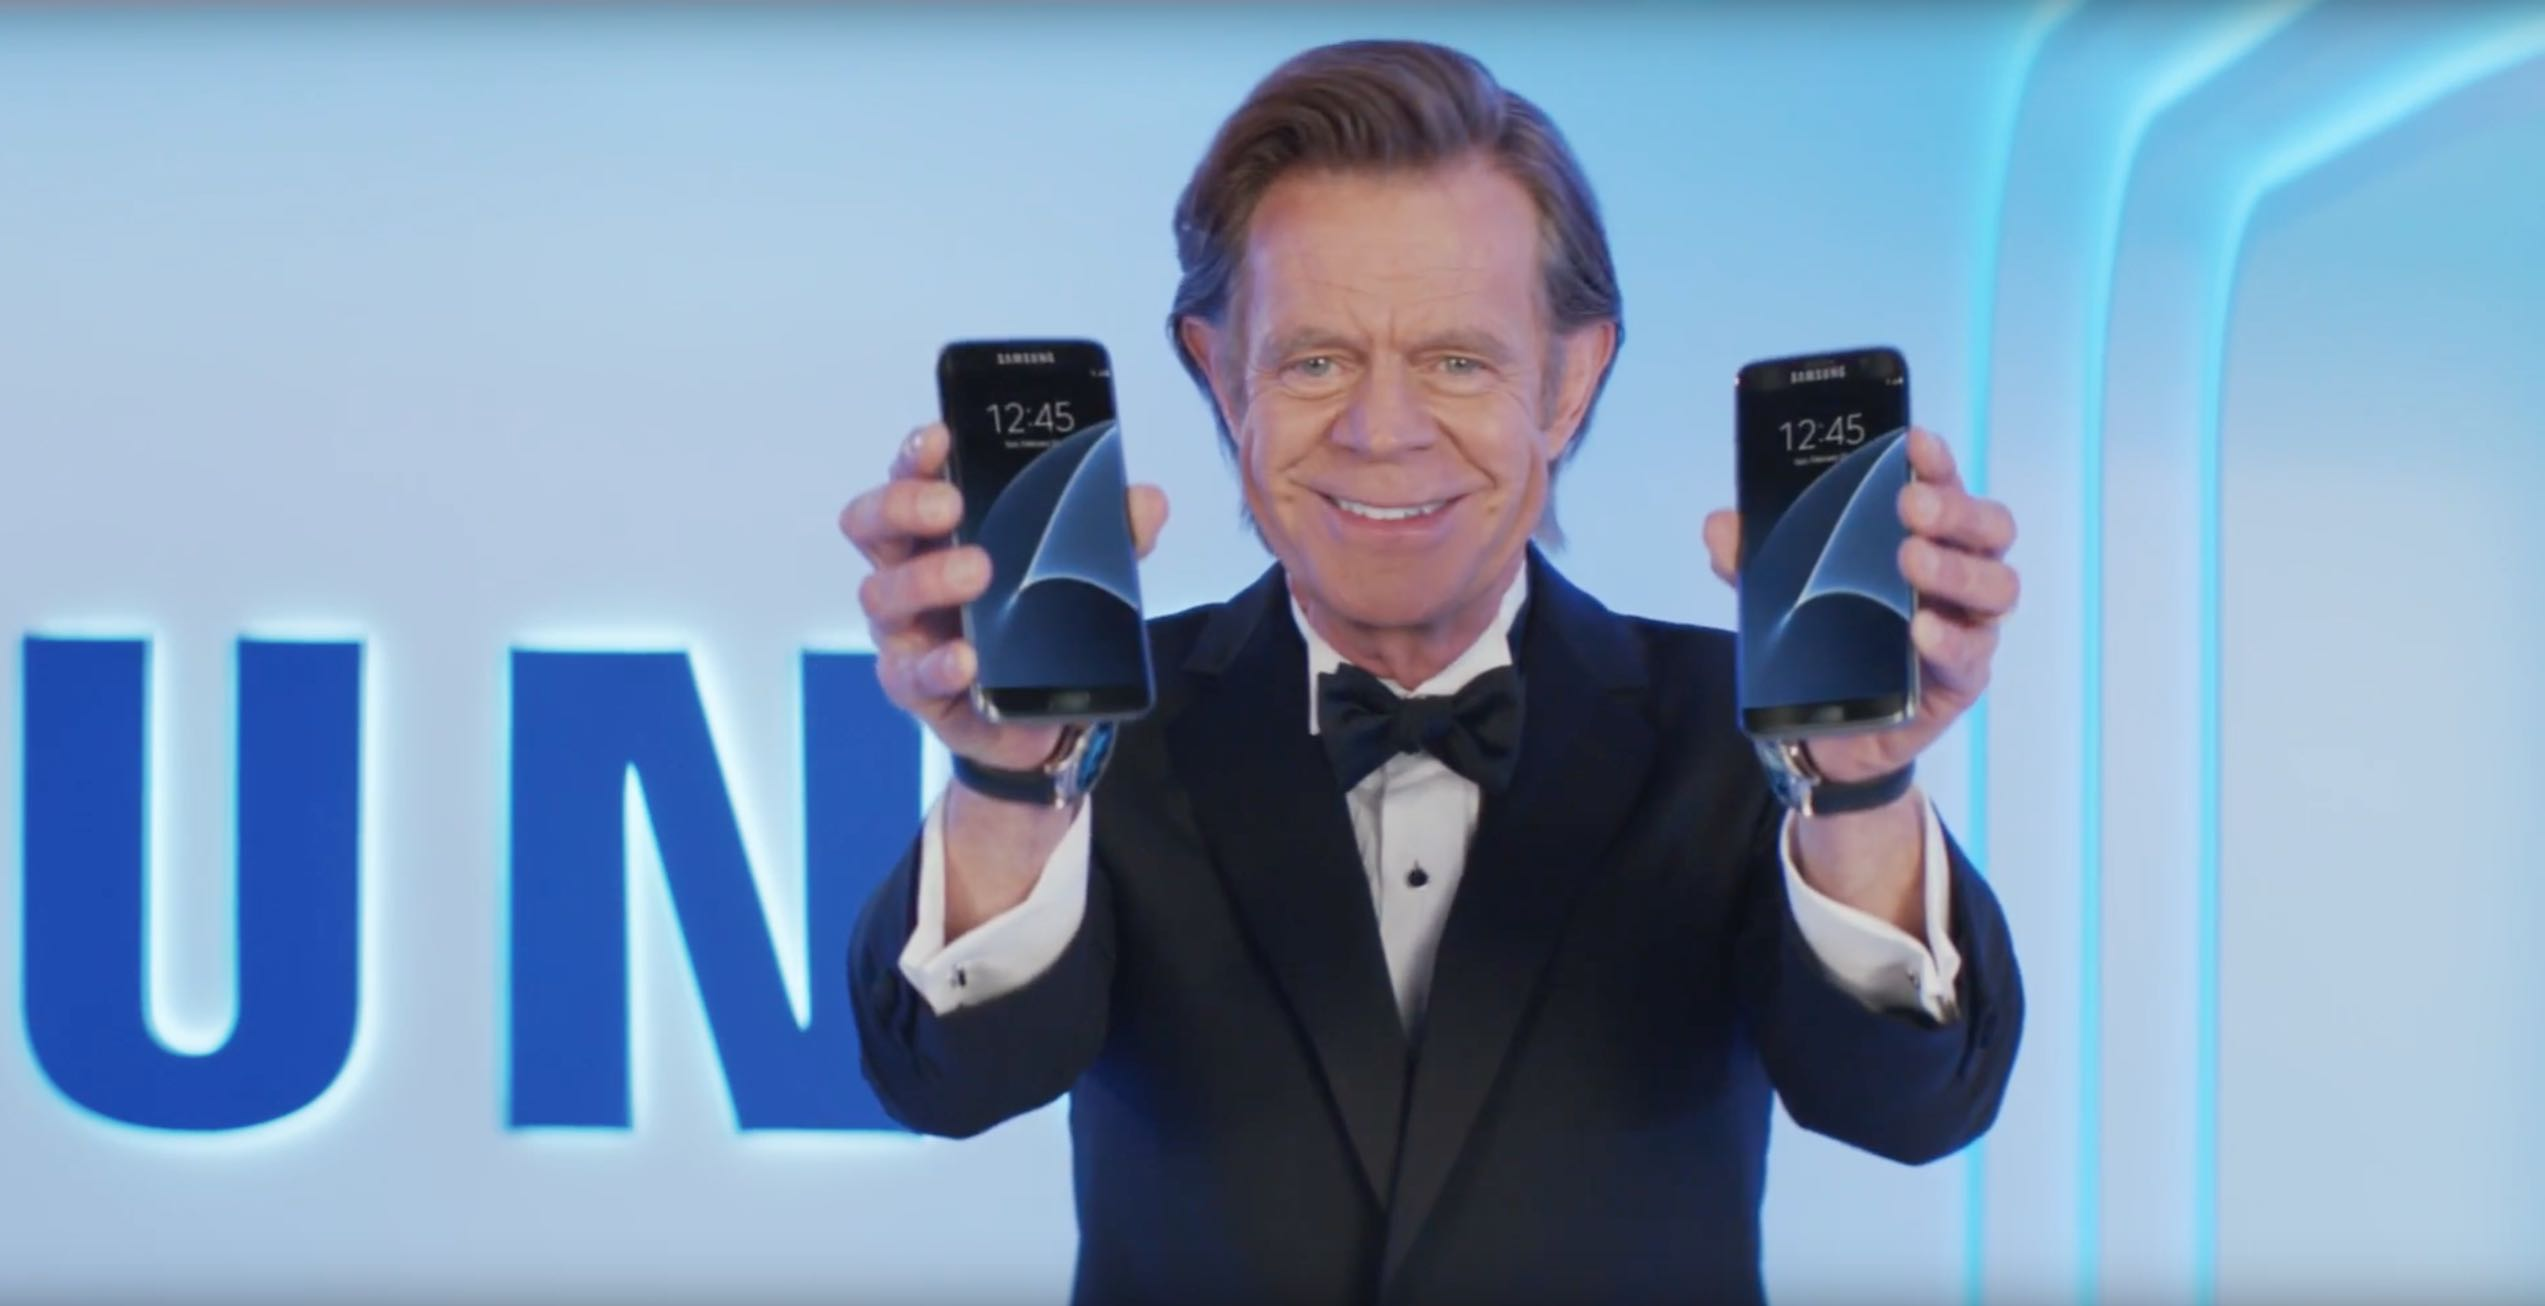 Samsung Galaxy S7 star-studded ad image 001